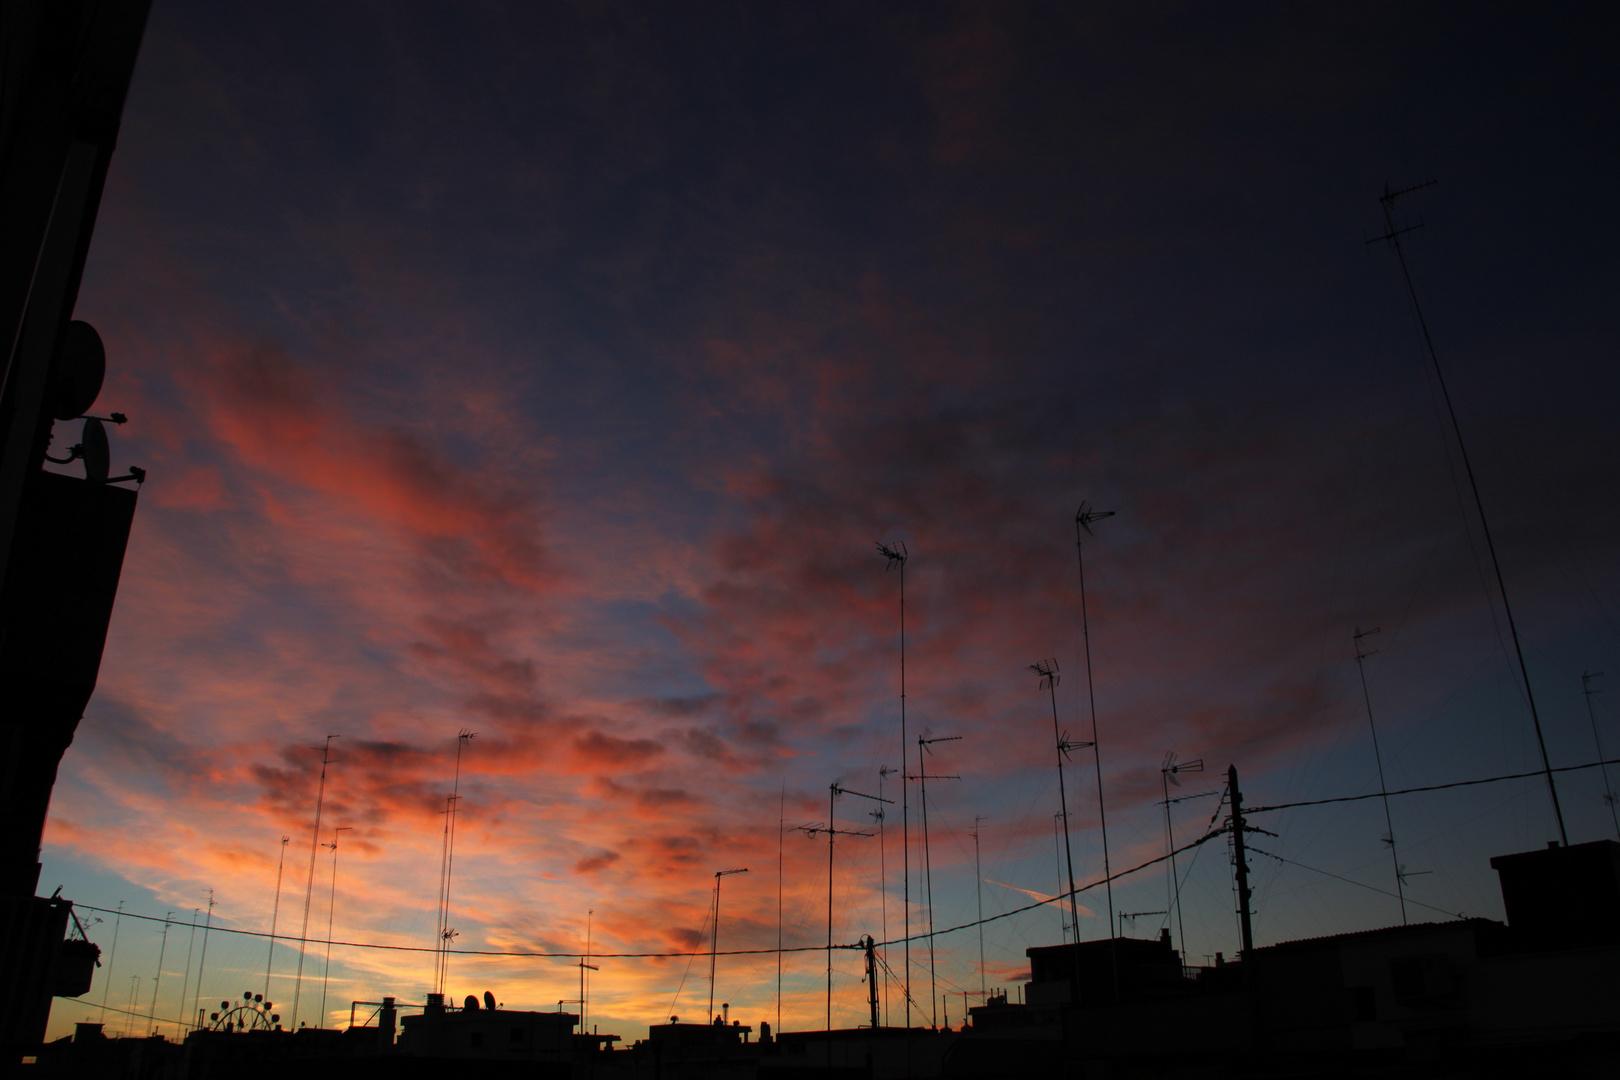 Amanecer redondo. 2 Puerto de Valencia, 6 de Diciembre 2012 8:20 AM